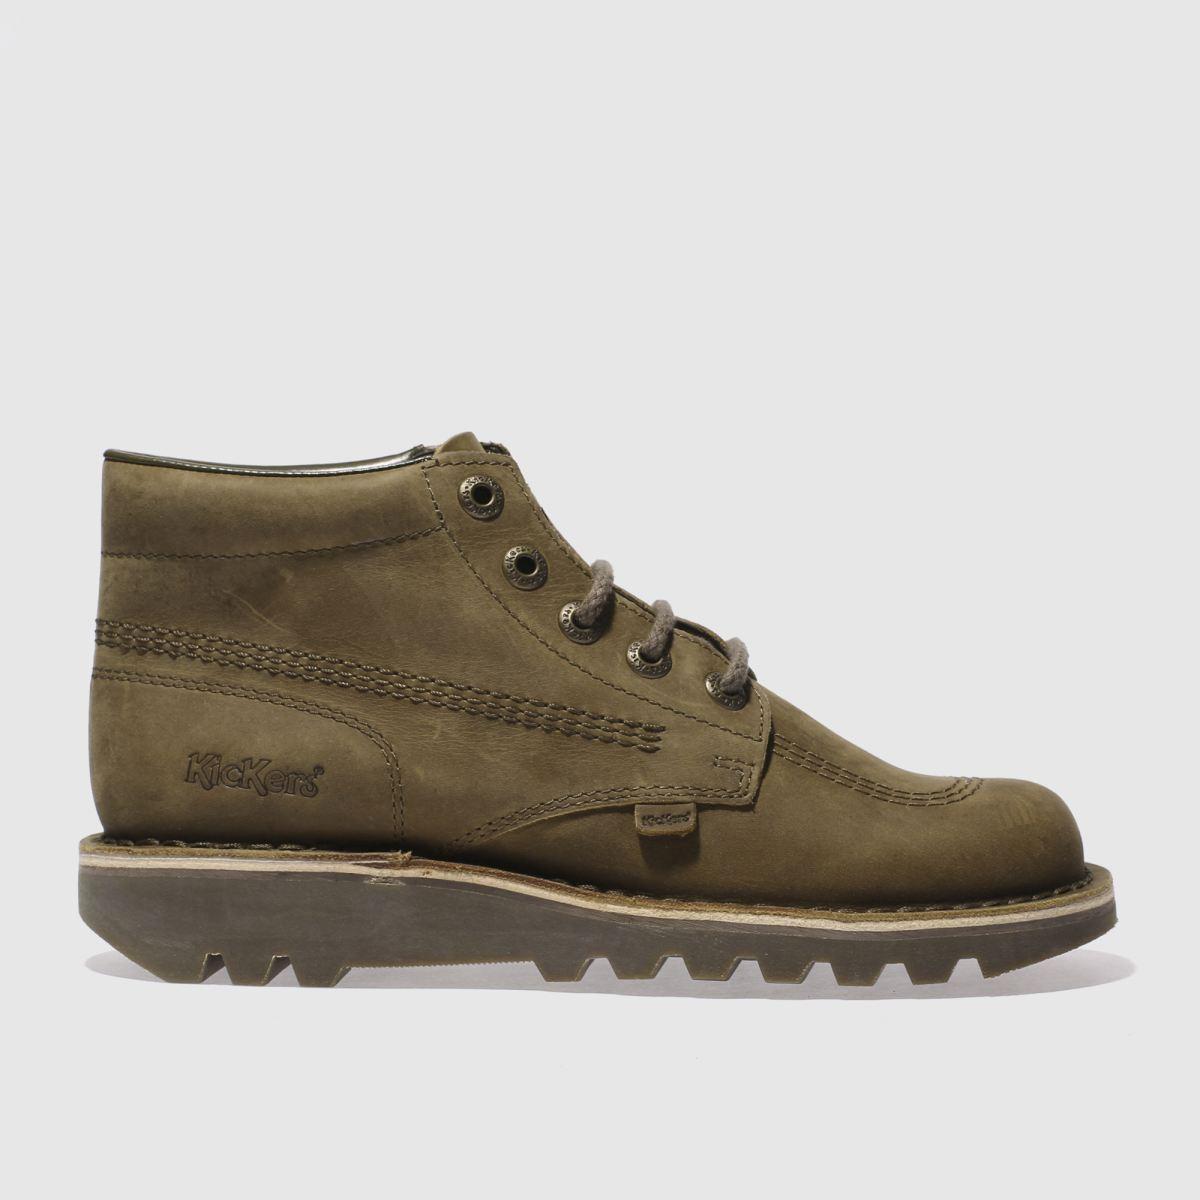 kickers khaki kick hi boots